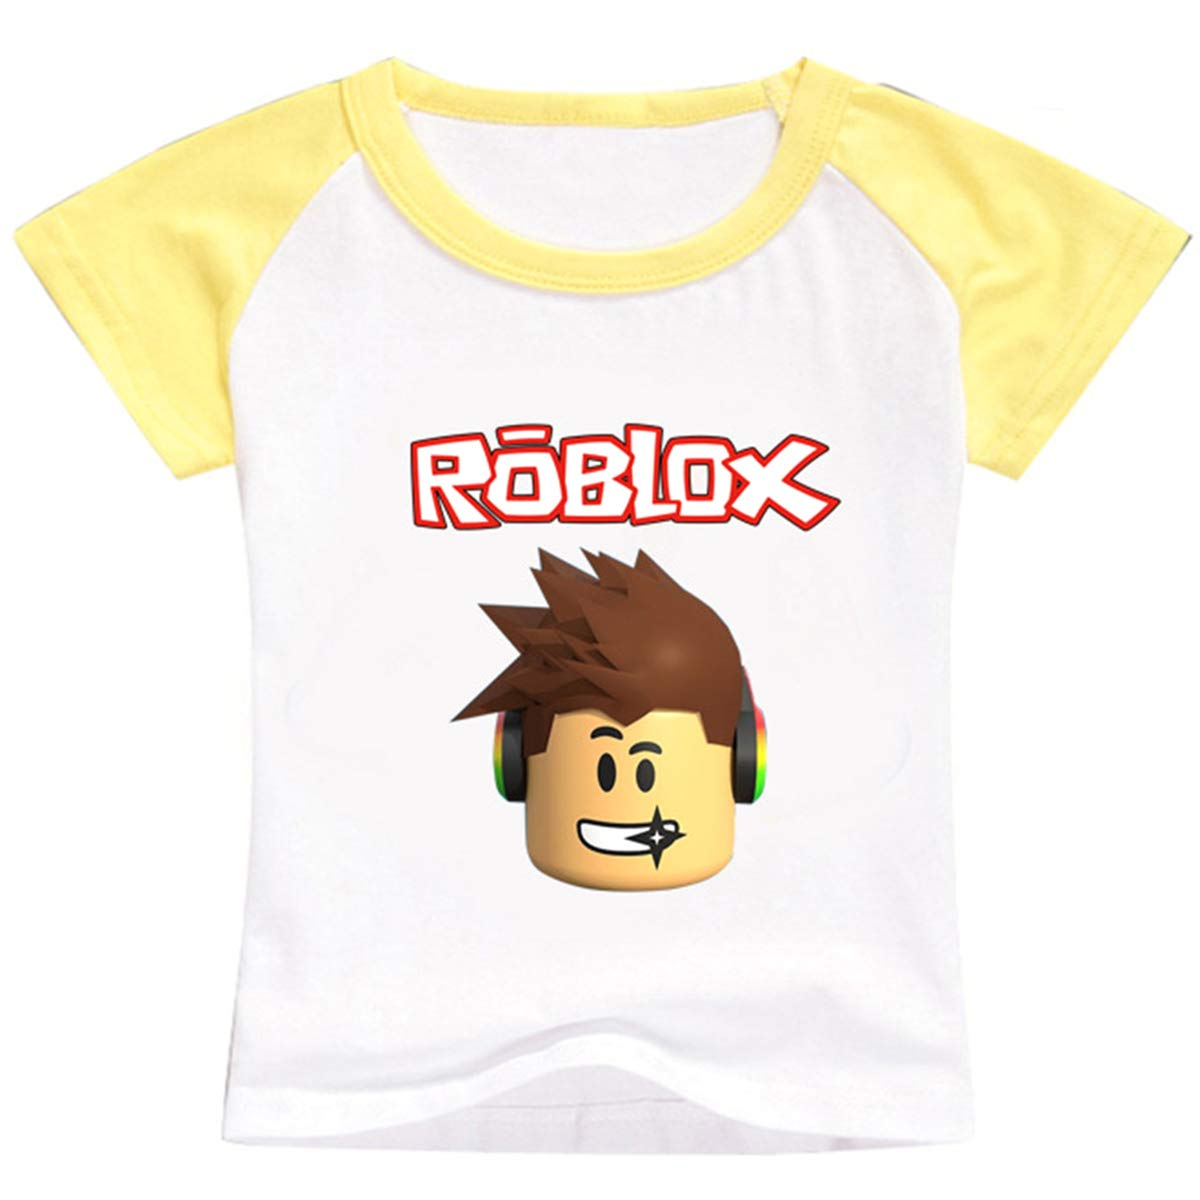 Cool Roblox Shirts For Free | Kuenzi Turf & Nursery